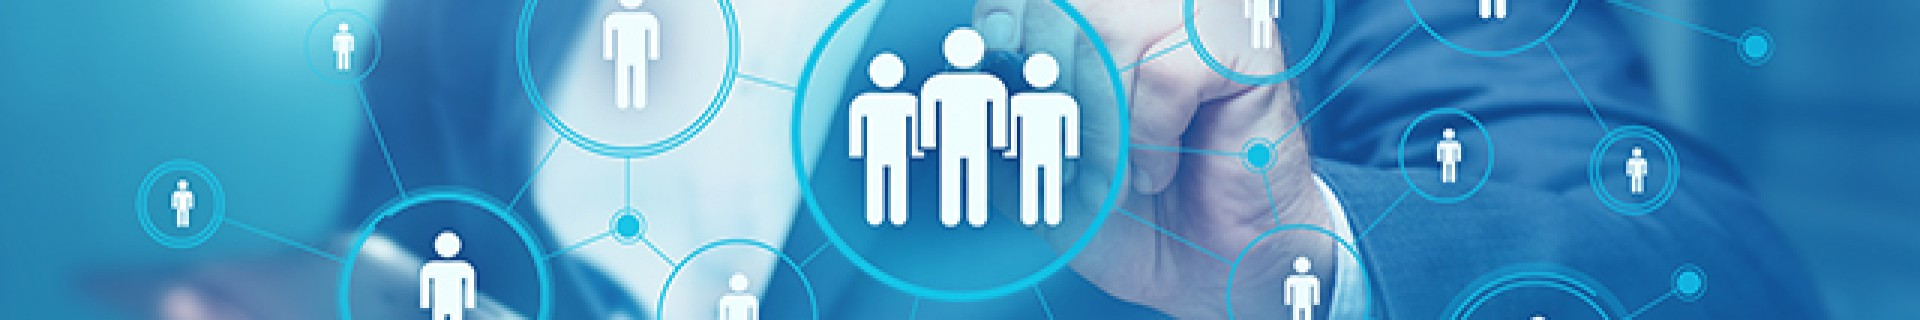 Управление на човешките ресурси и лидерско поведение